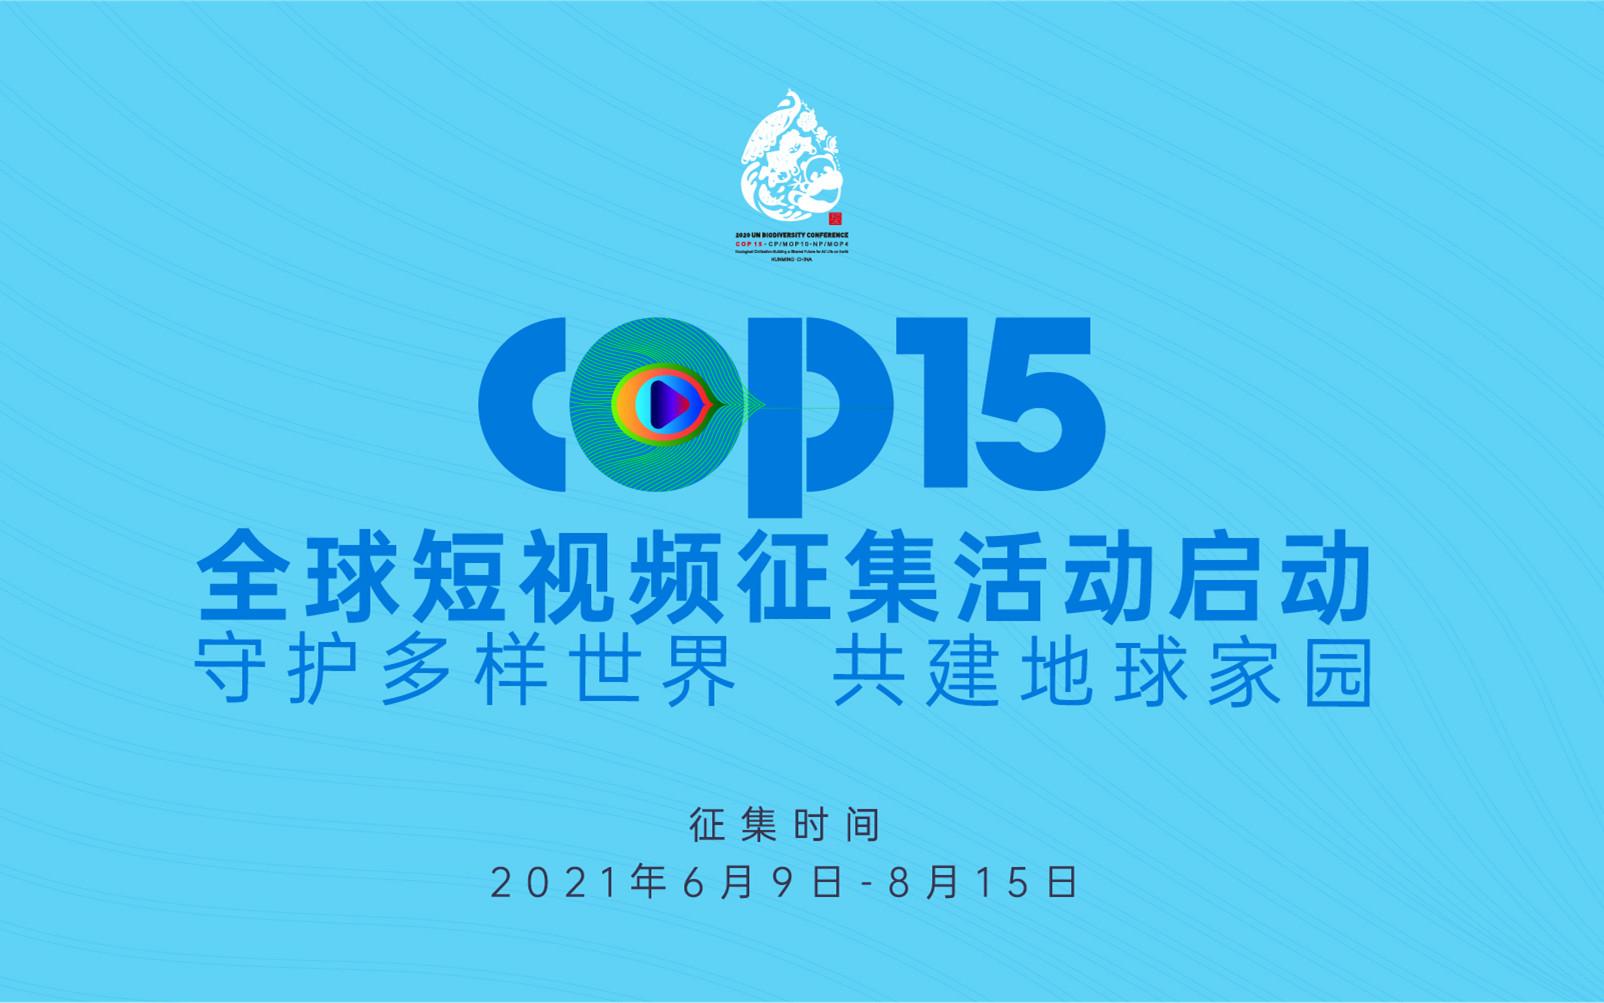 COP15全球短视频征集活动